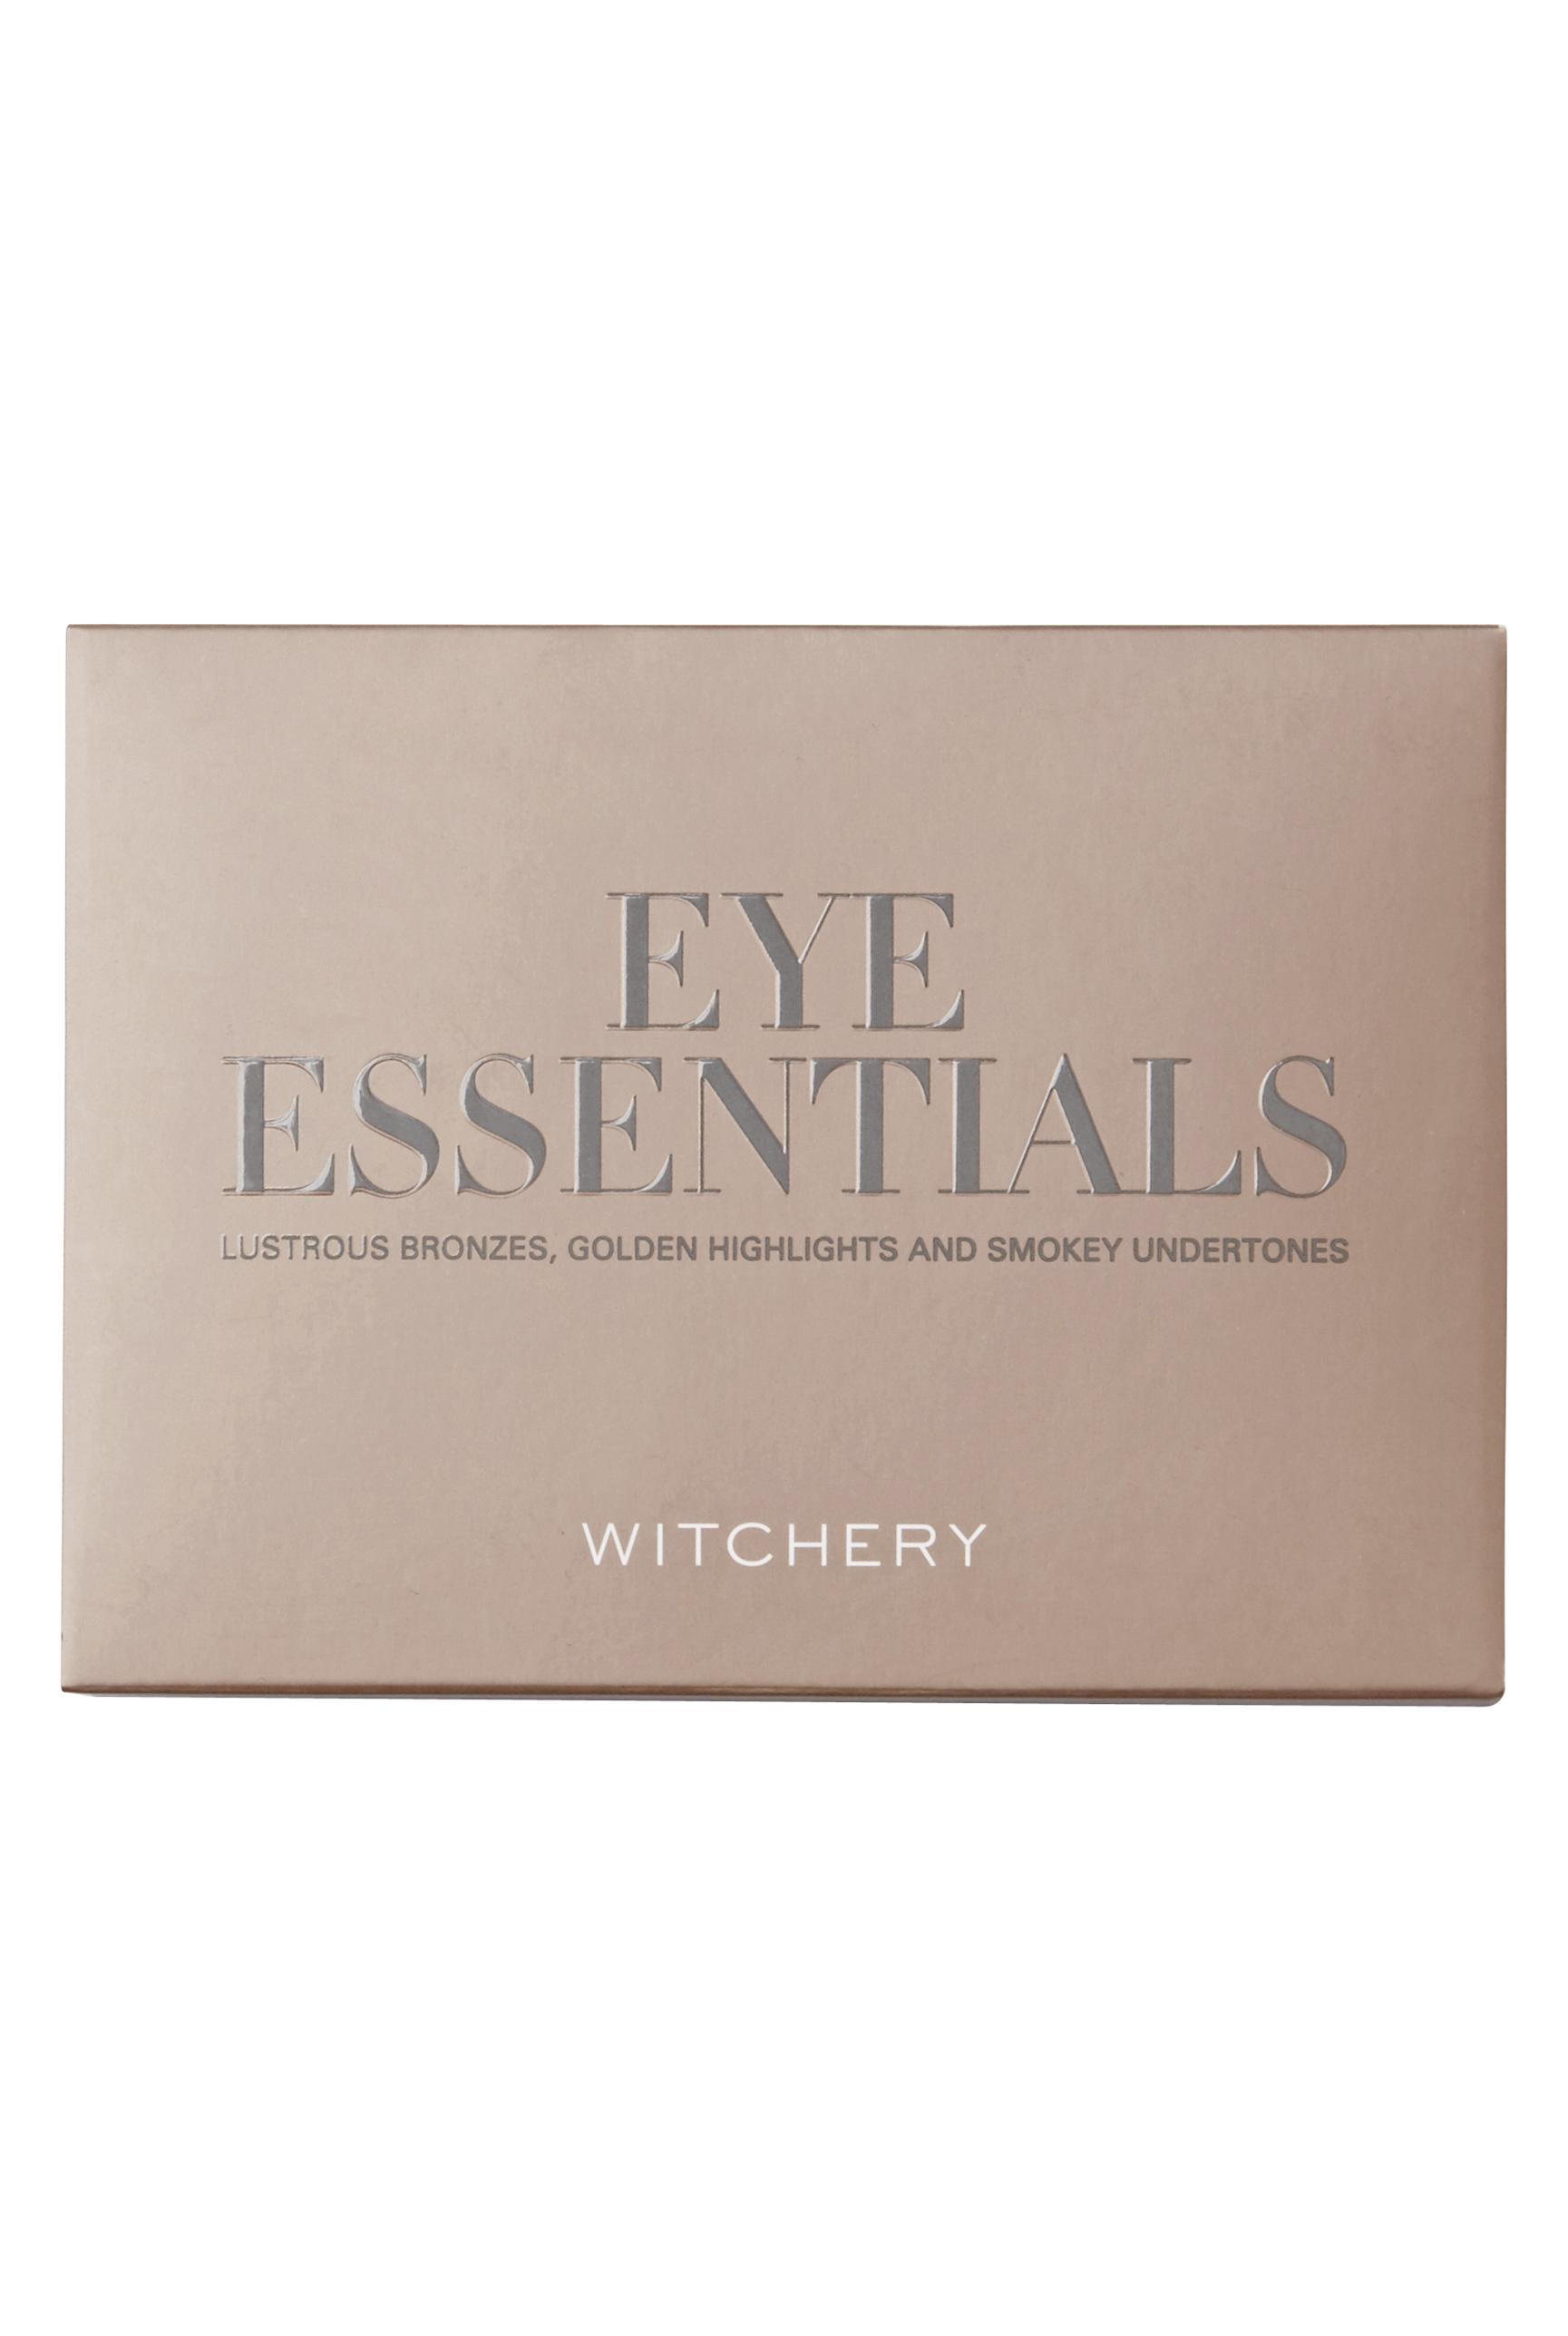 60194046_witcherybeauty-eye-essentials-rrp34-902